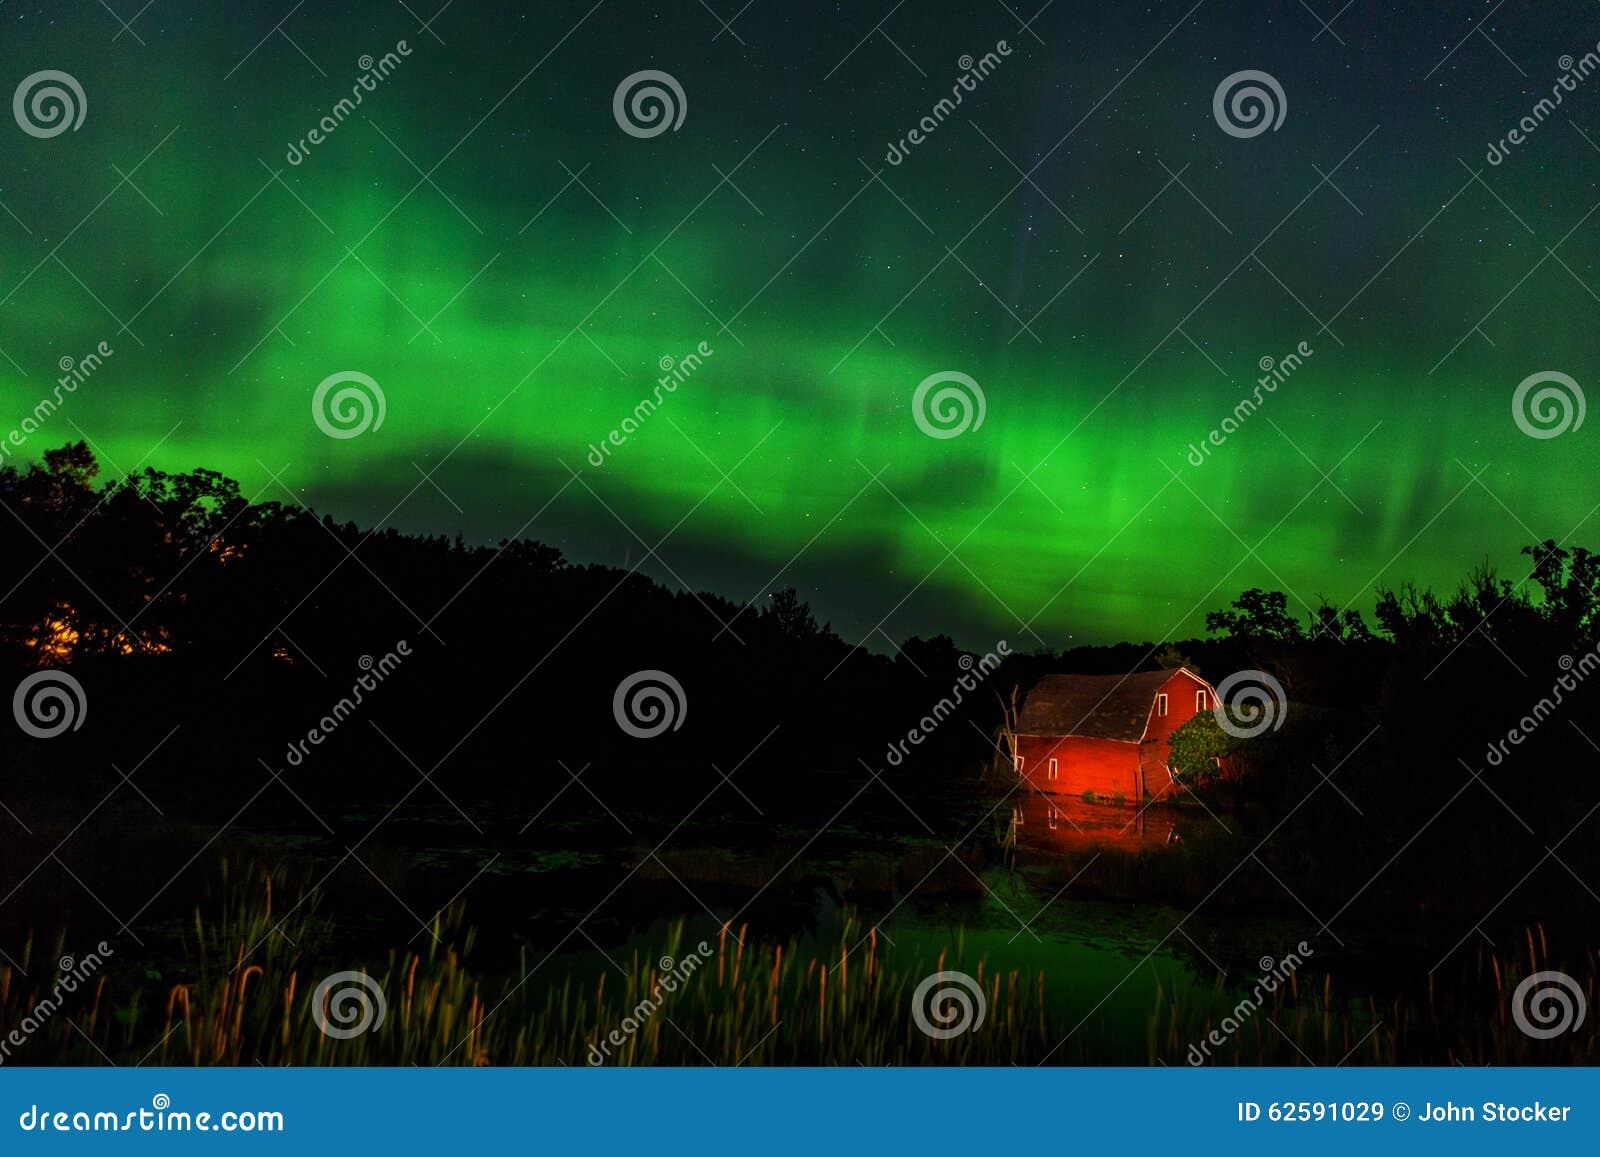 zimmerman aurora stock image image of still borealis 62591029